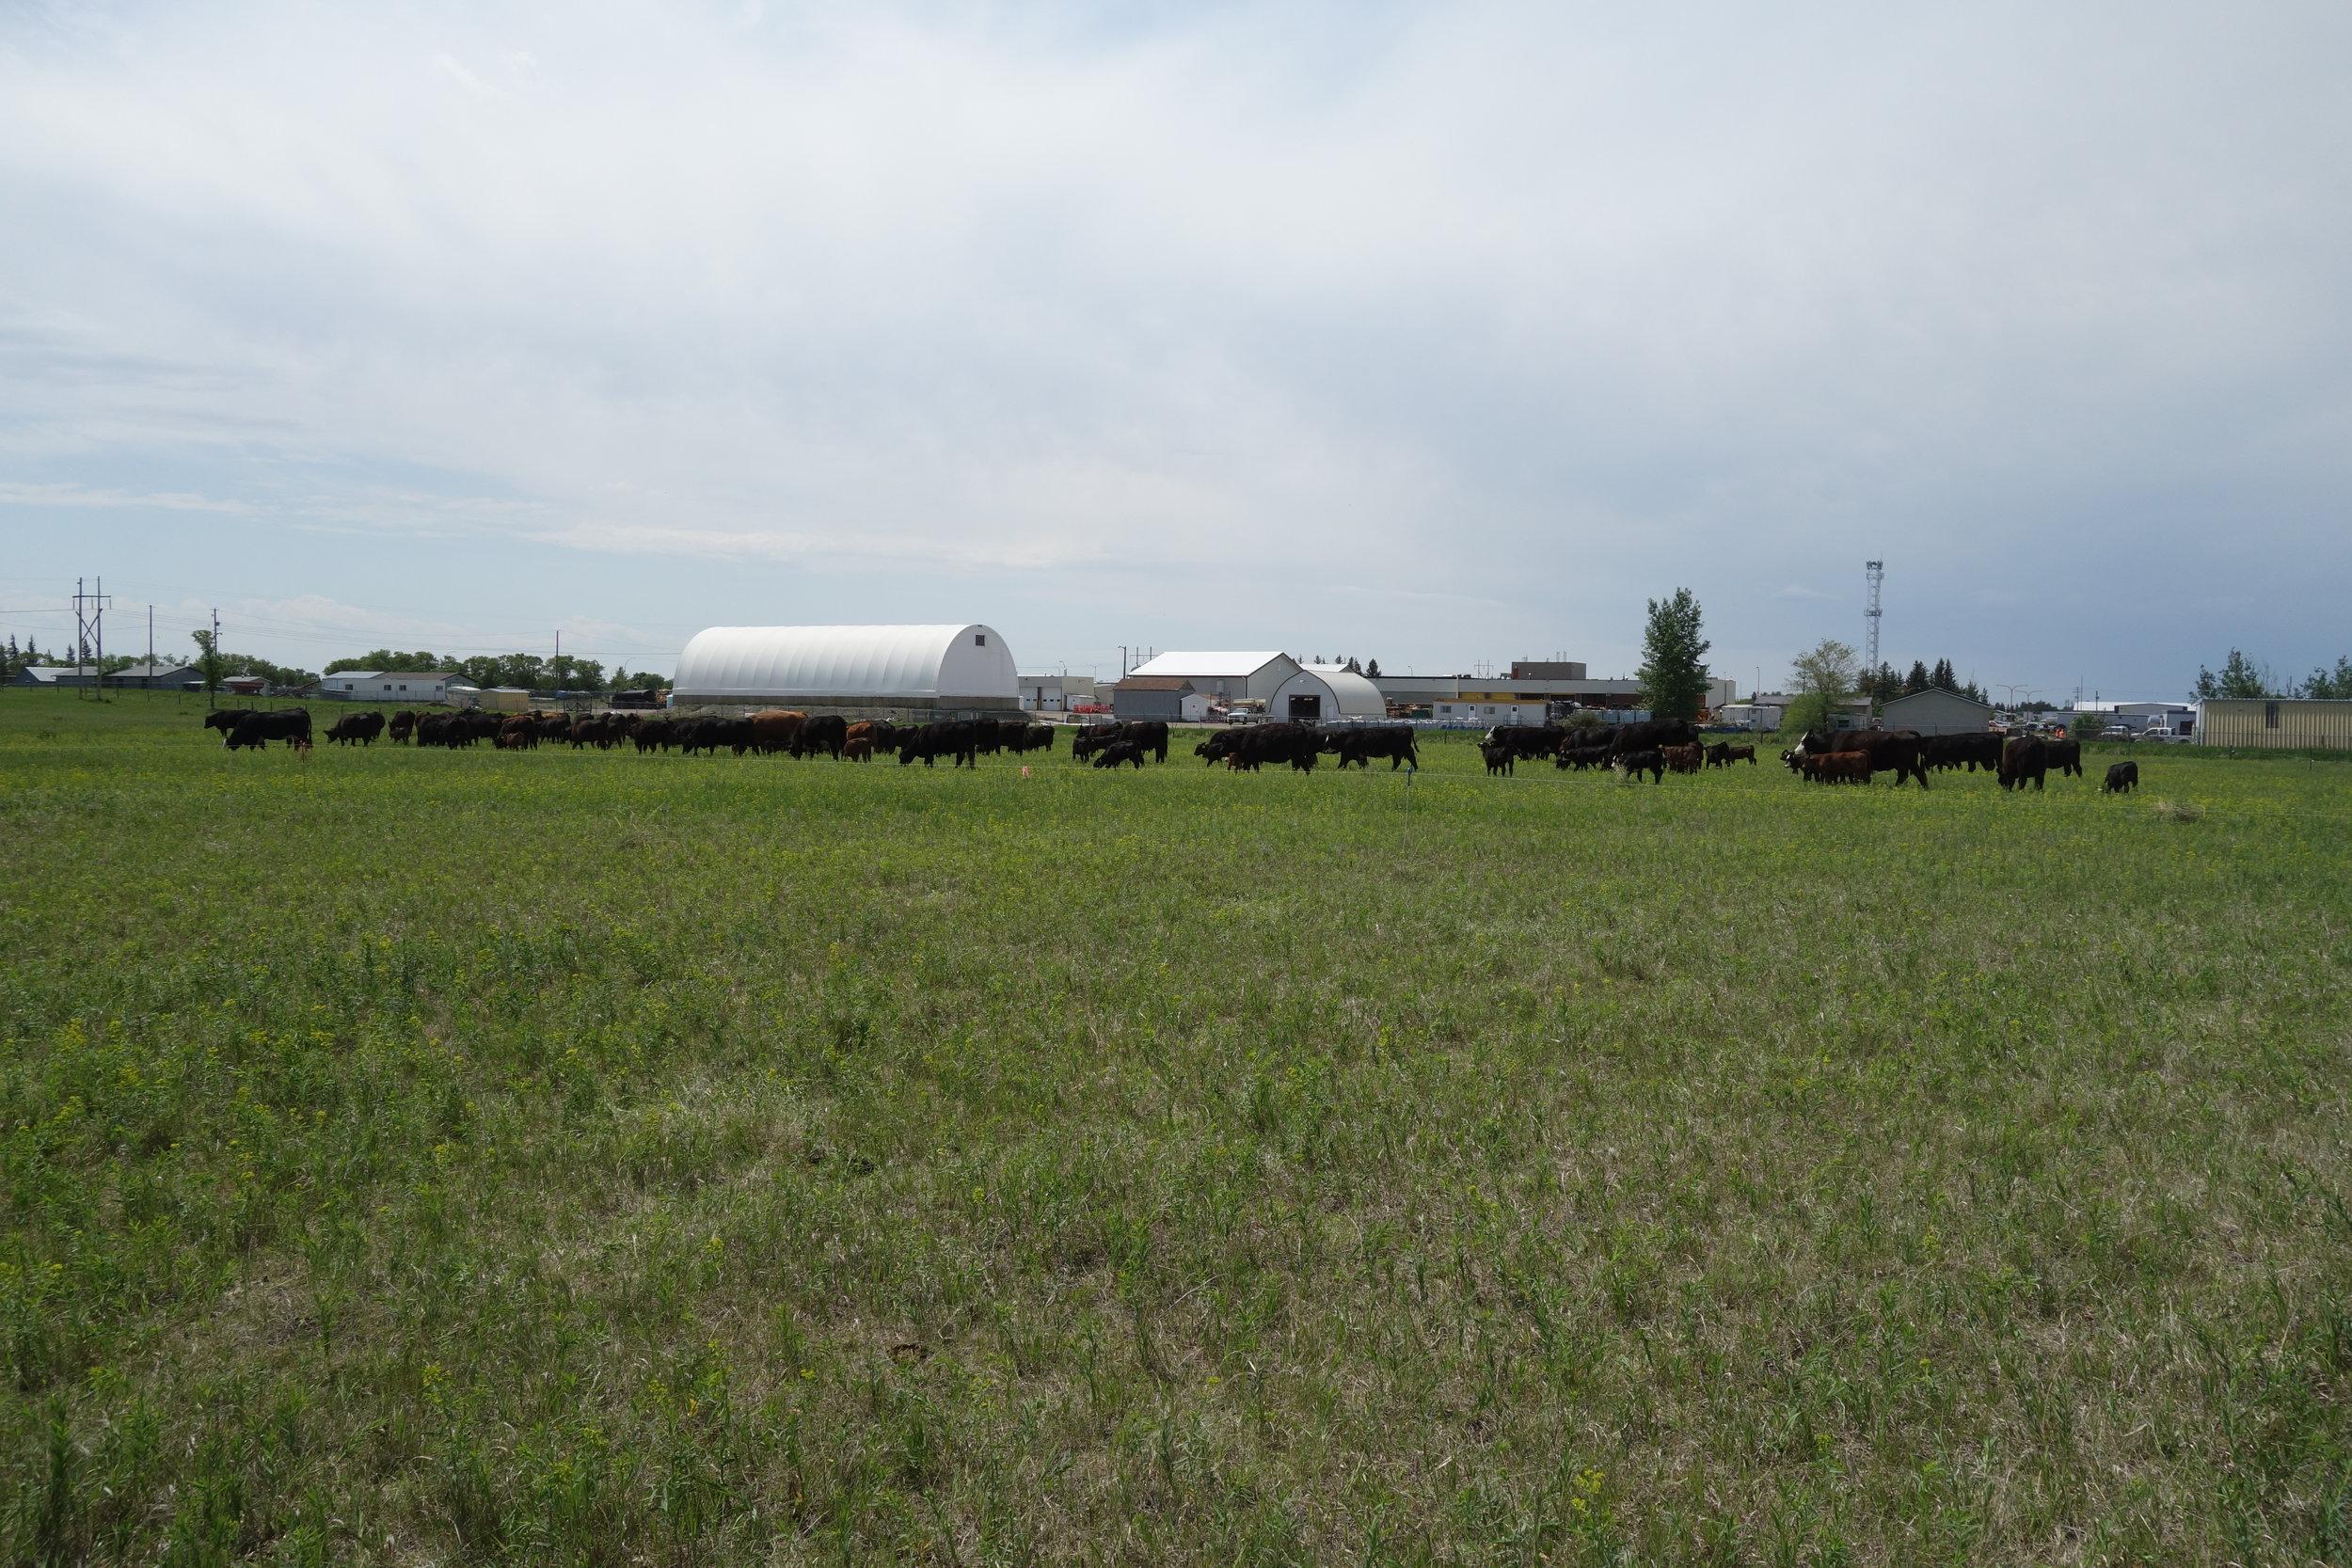 Alfalfa mob grazing project at 1st Street Pasture